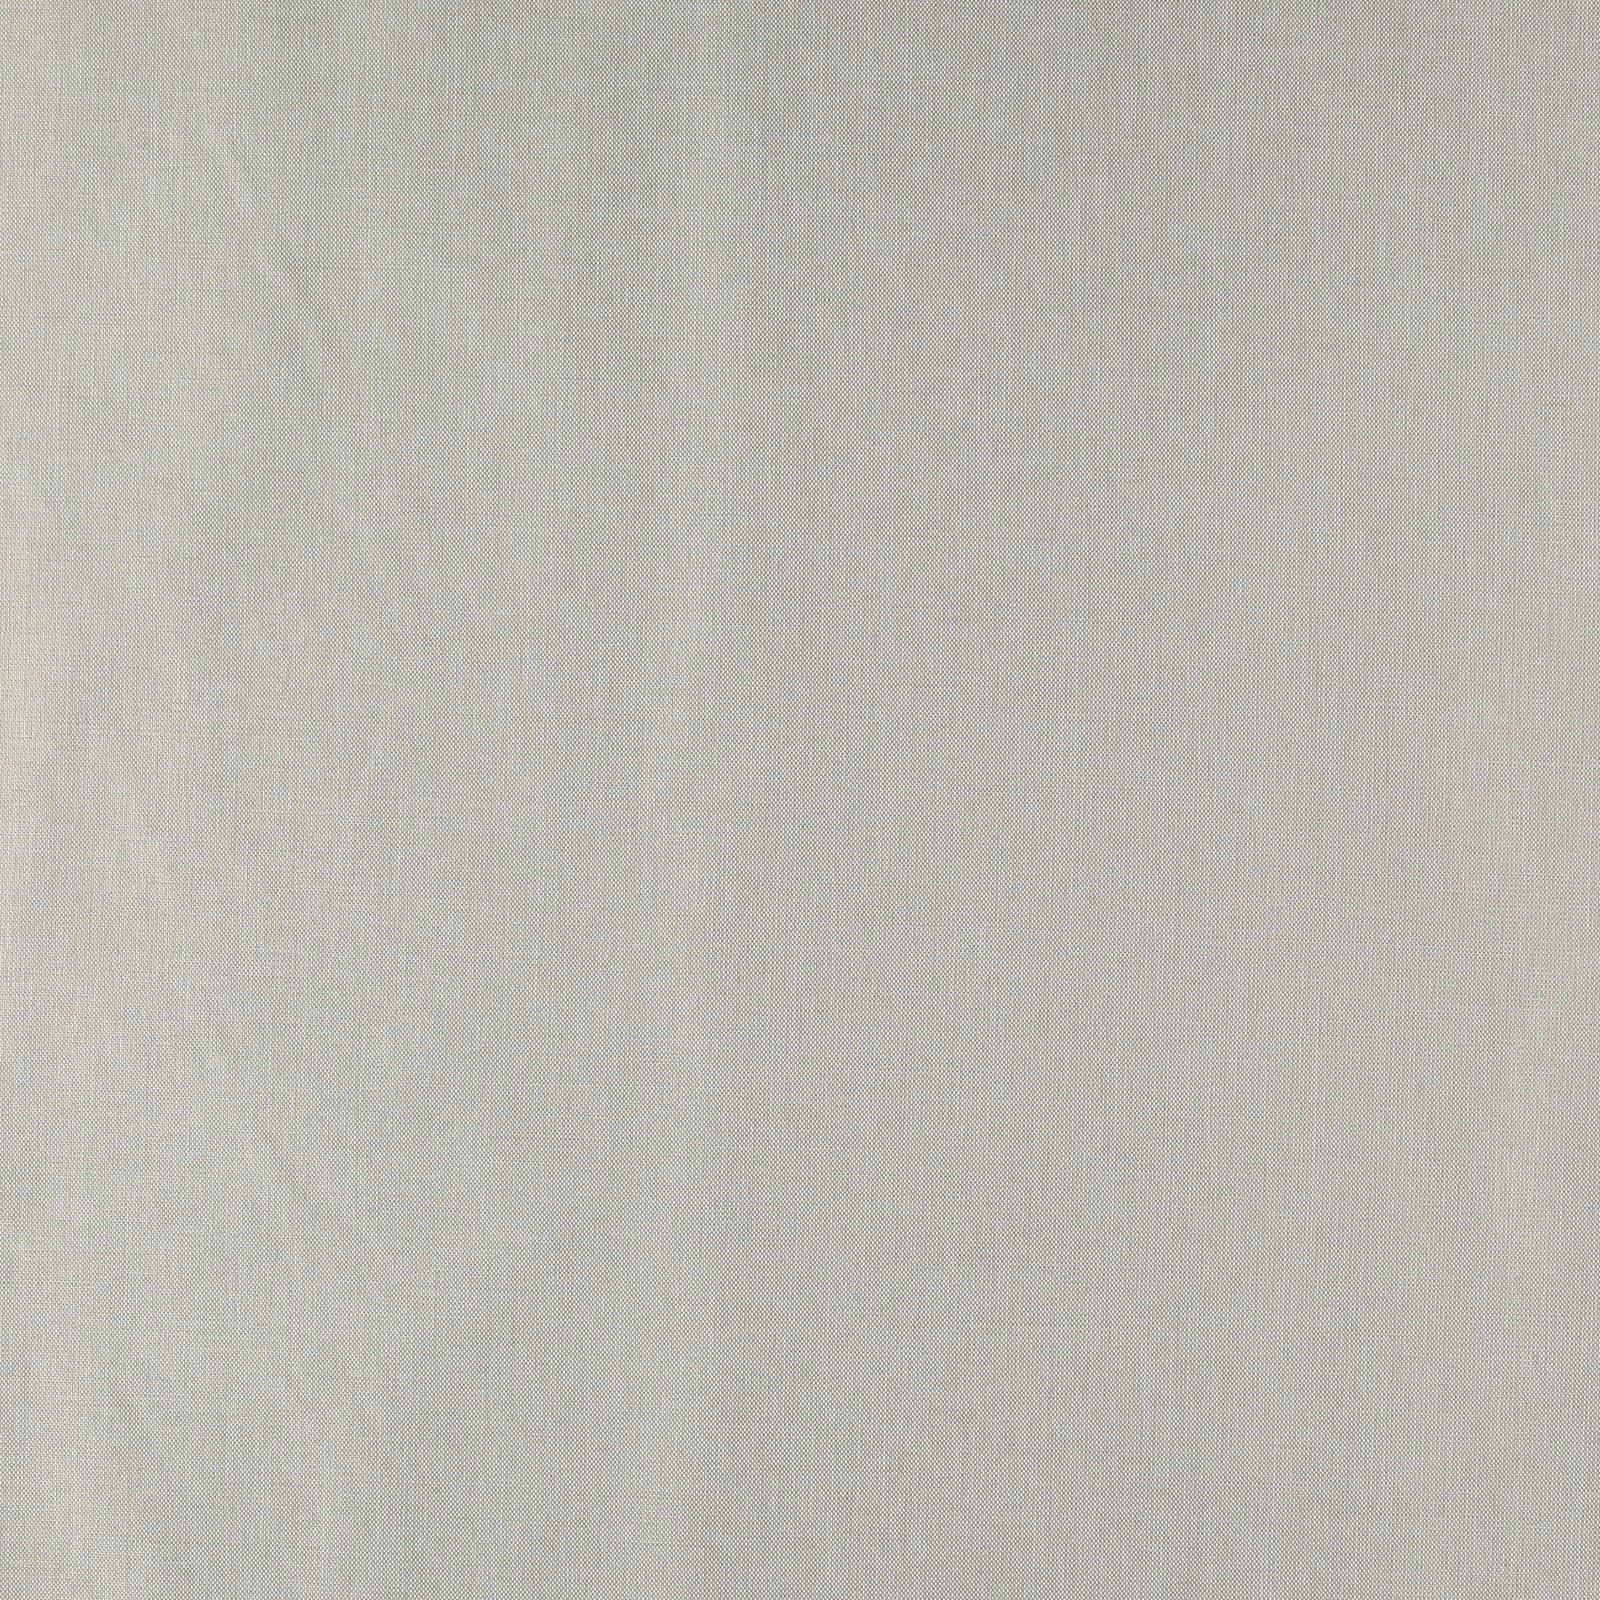 Upholstery fabric beige melange 823992_pack_solid